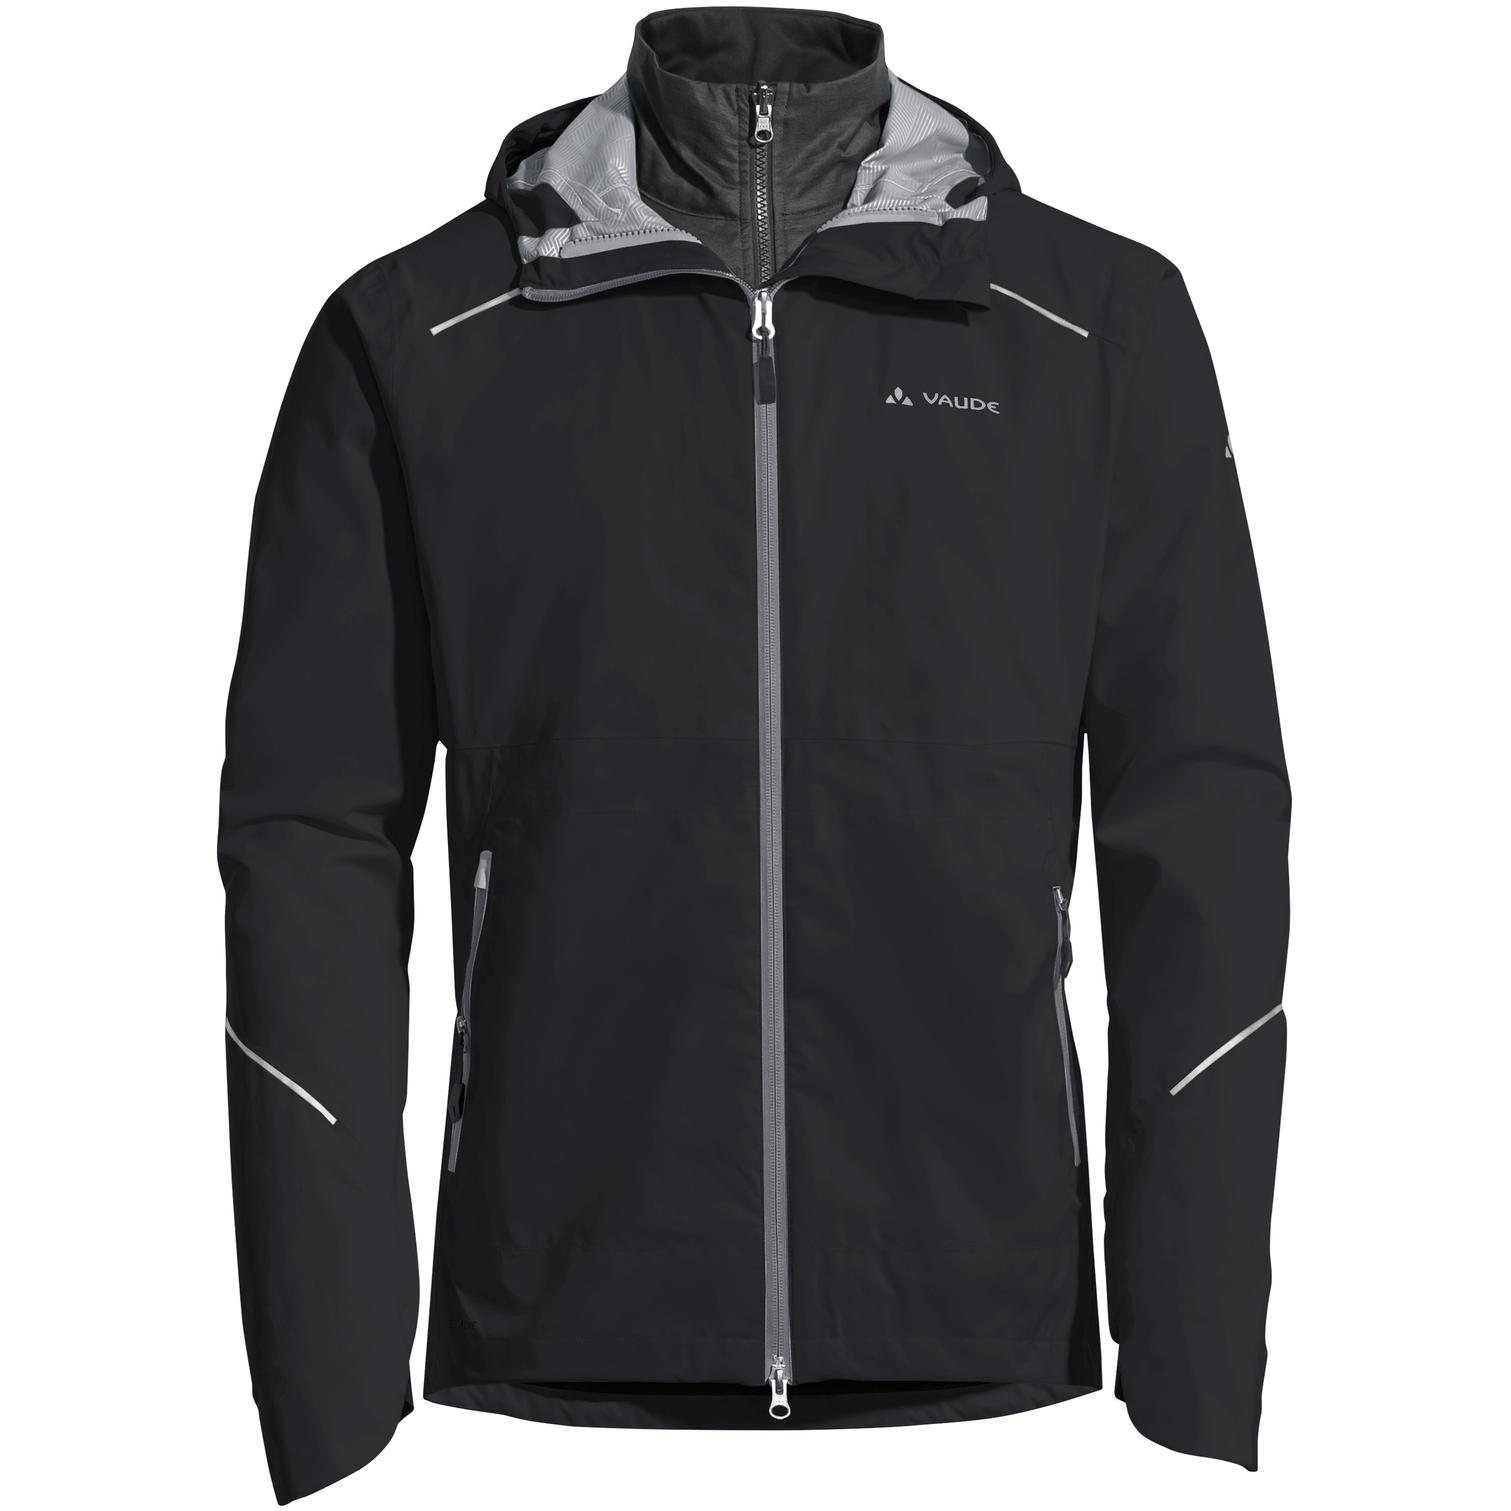 Image of Vaude Men's Yaras 3in1 Jacket - black uni